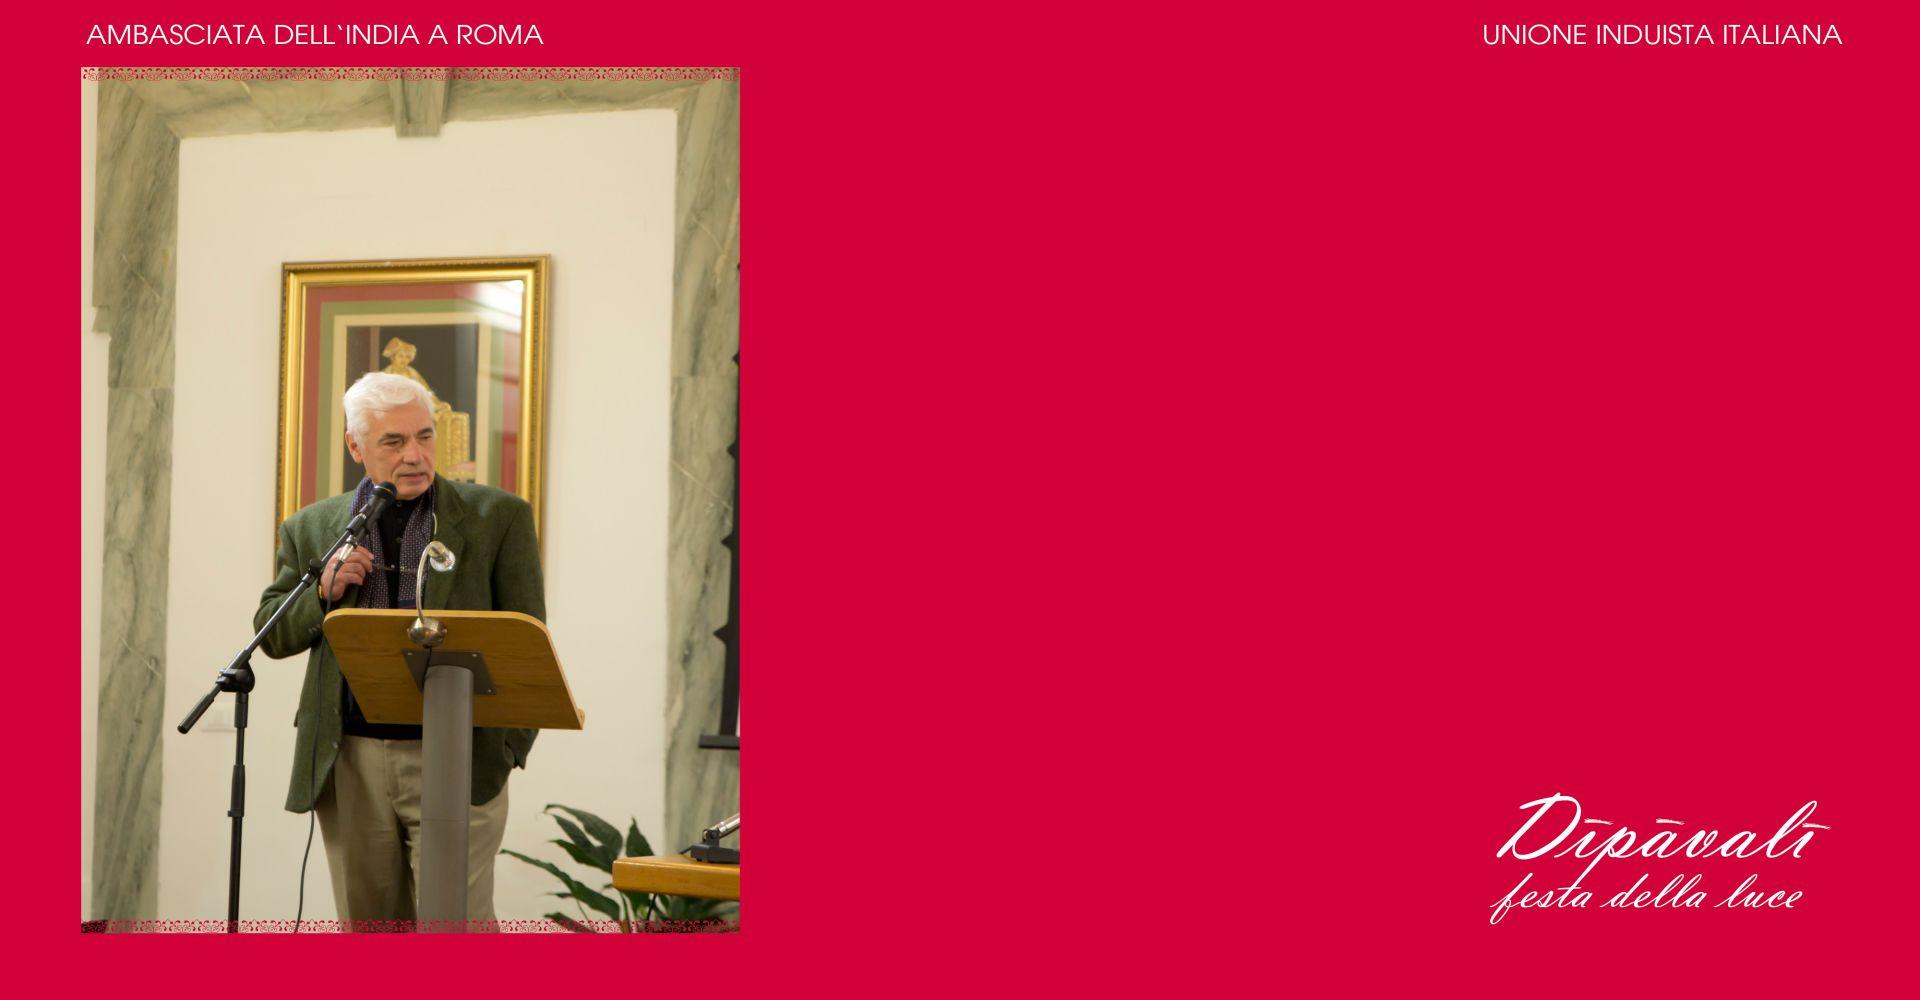 dipavali-foto-ambasciata28